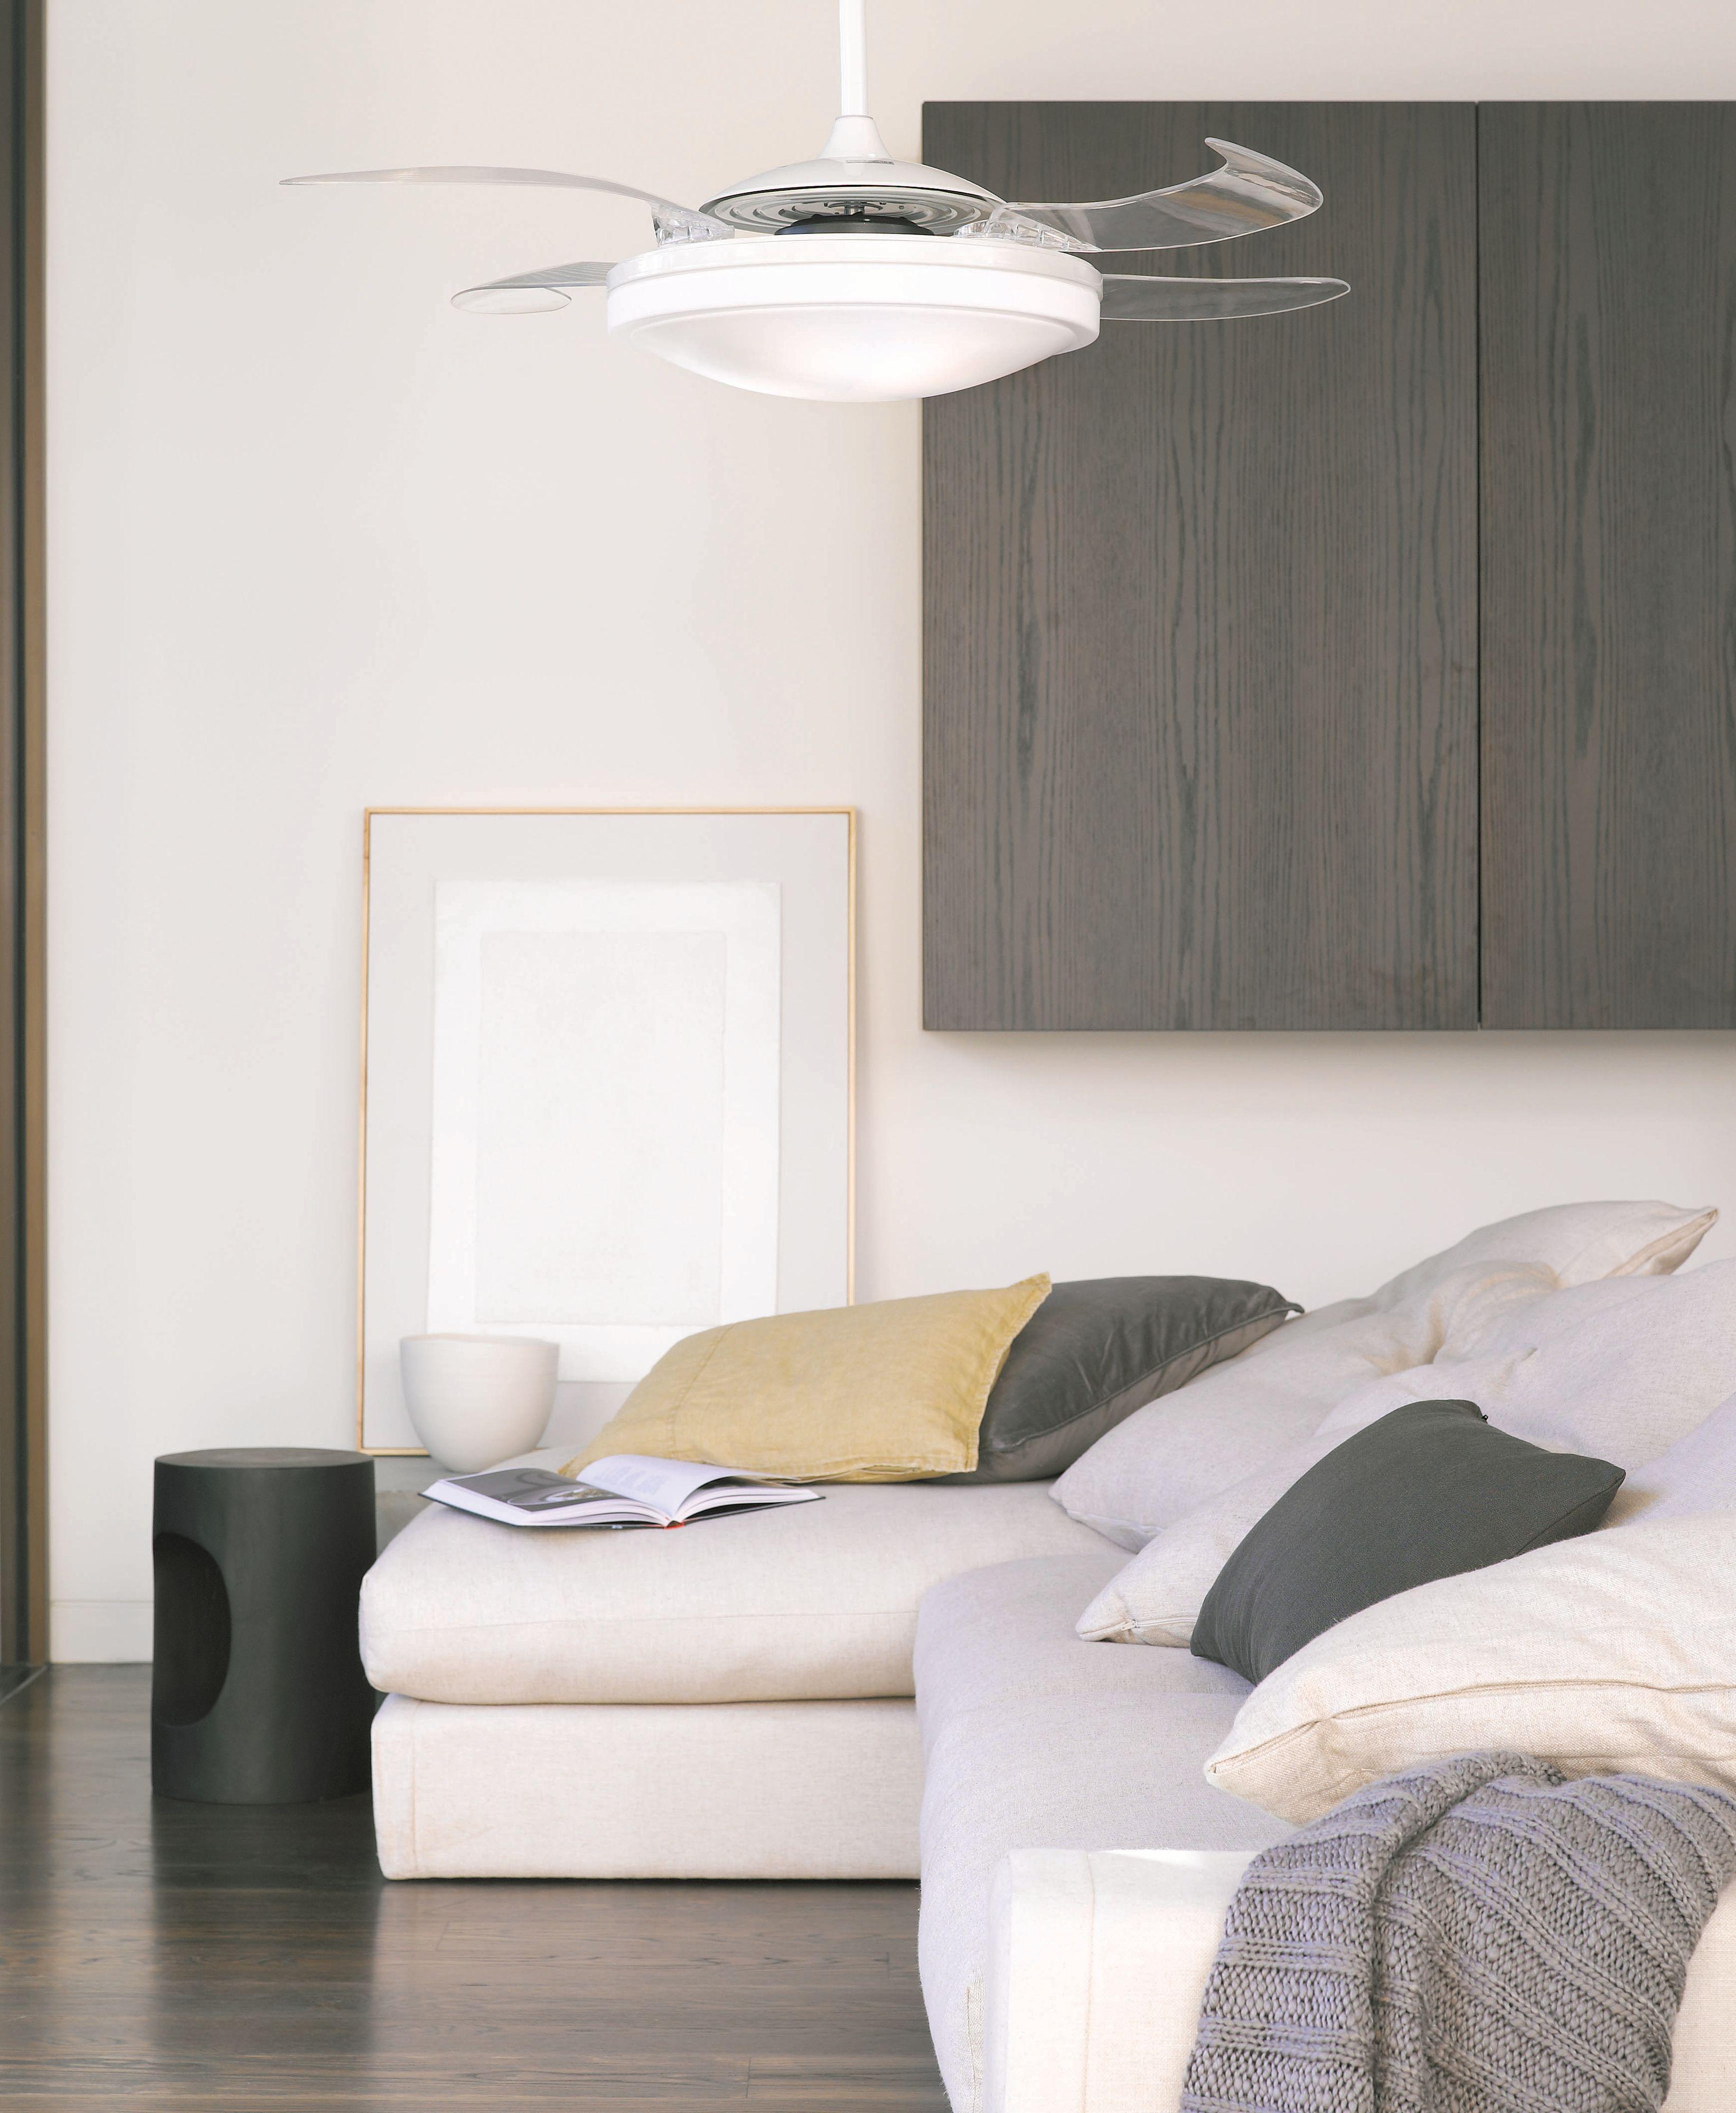 deckenventilator fanaway led evo1 dimmbar wei 122 cm. Black Bedroom Furniture Sets. Home Design Ideas